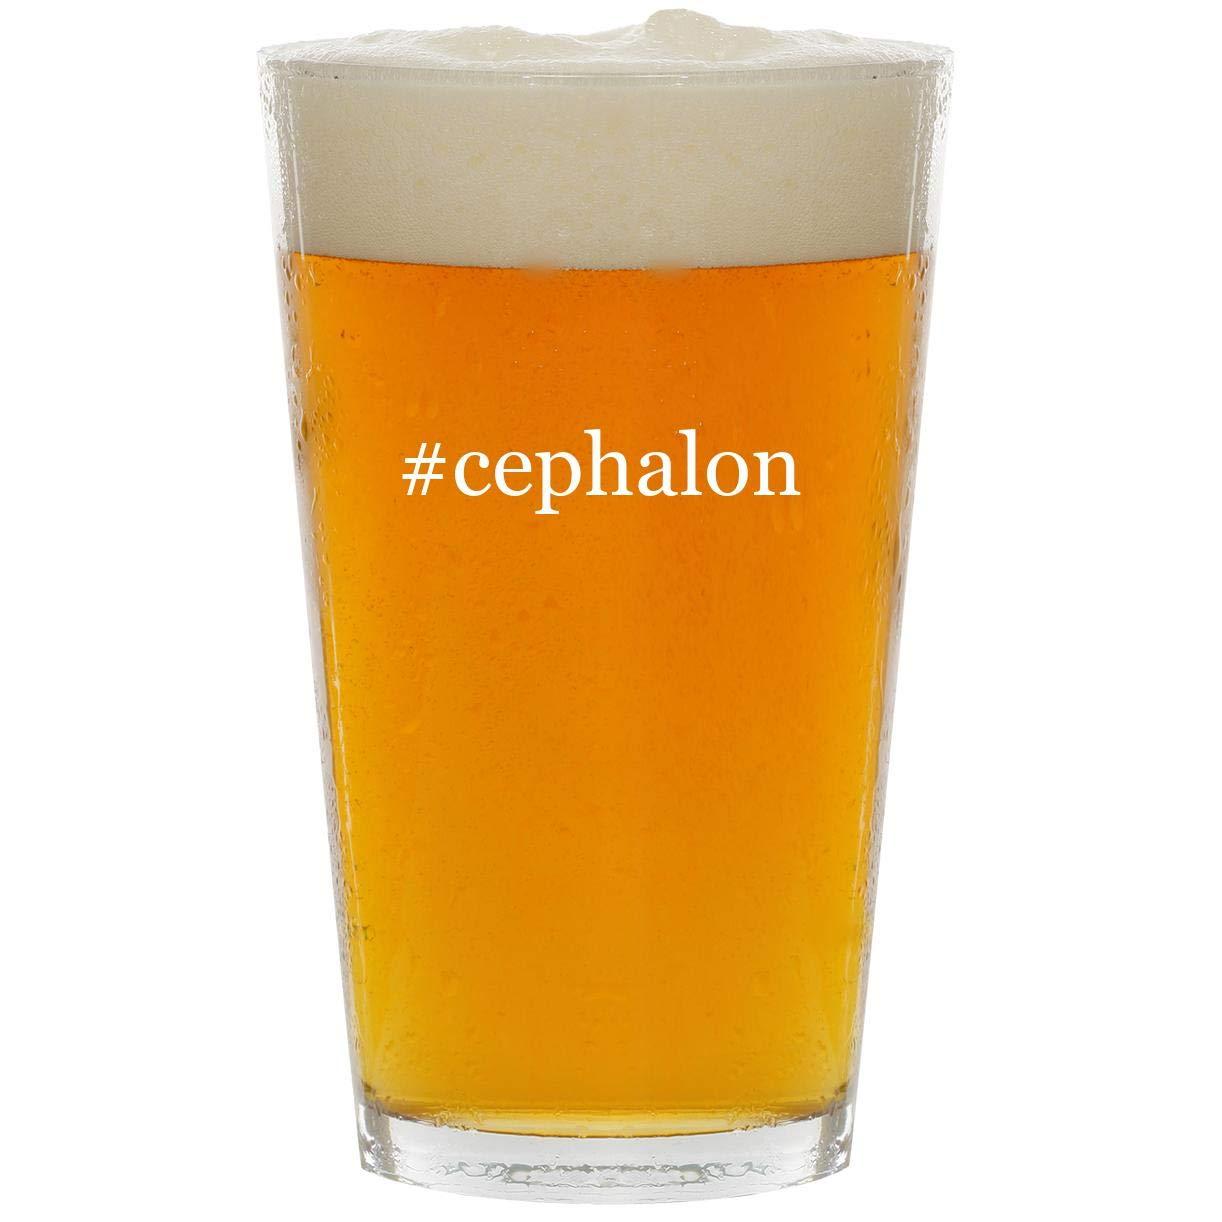 #cephalon - Glass Hashtag 16oz Beer Pint